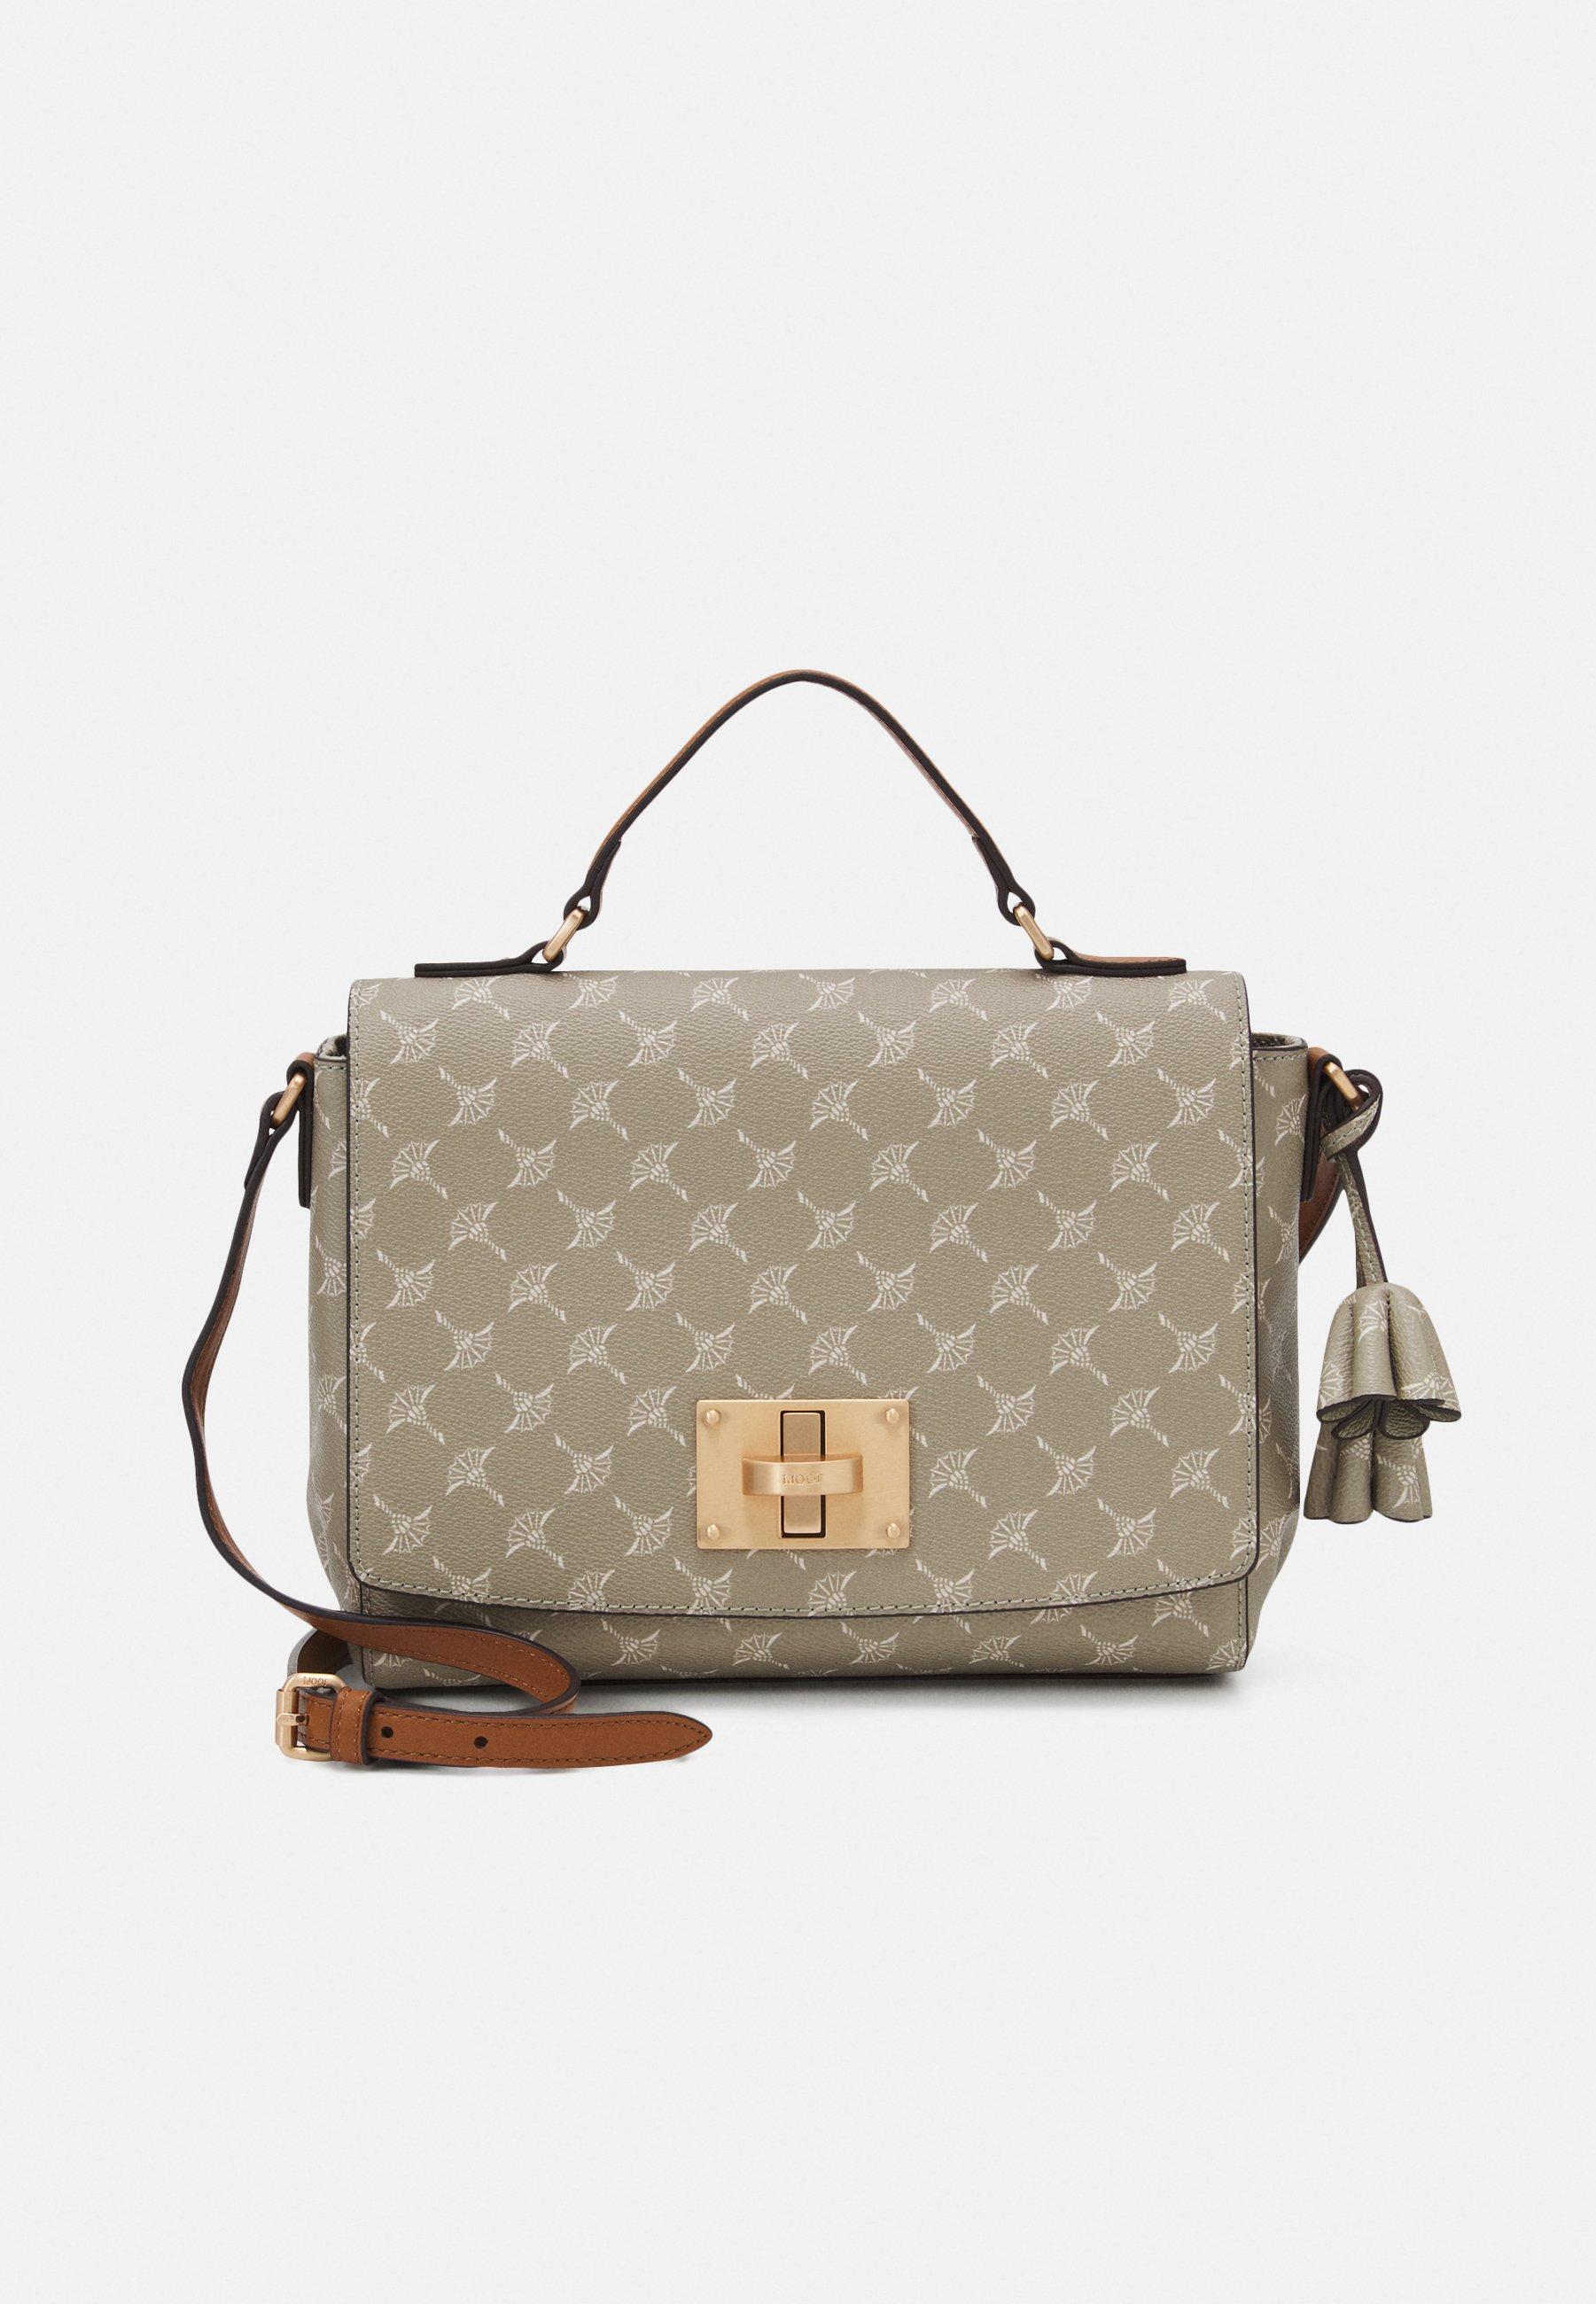 Damen CORTINA MAILA SHOULDERBAG - Handtasche